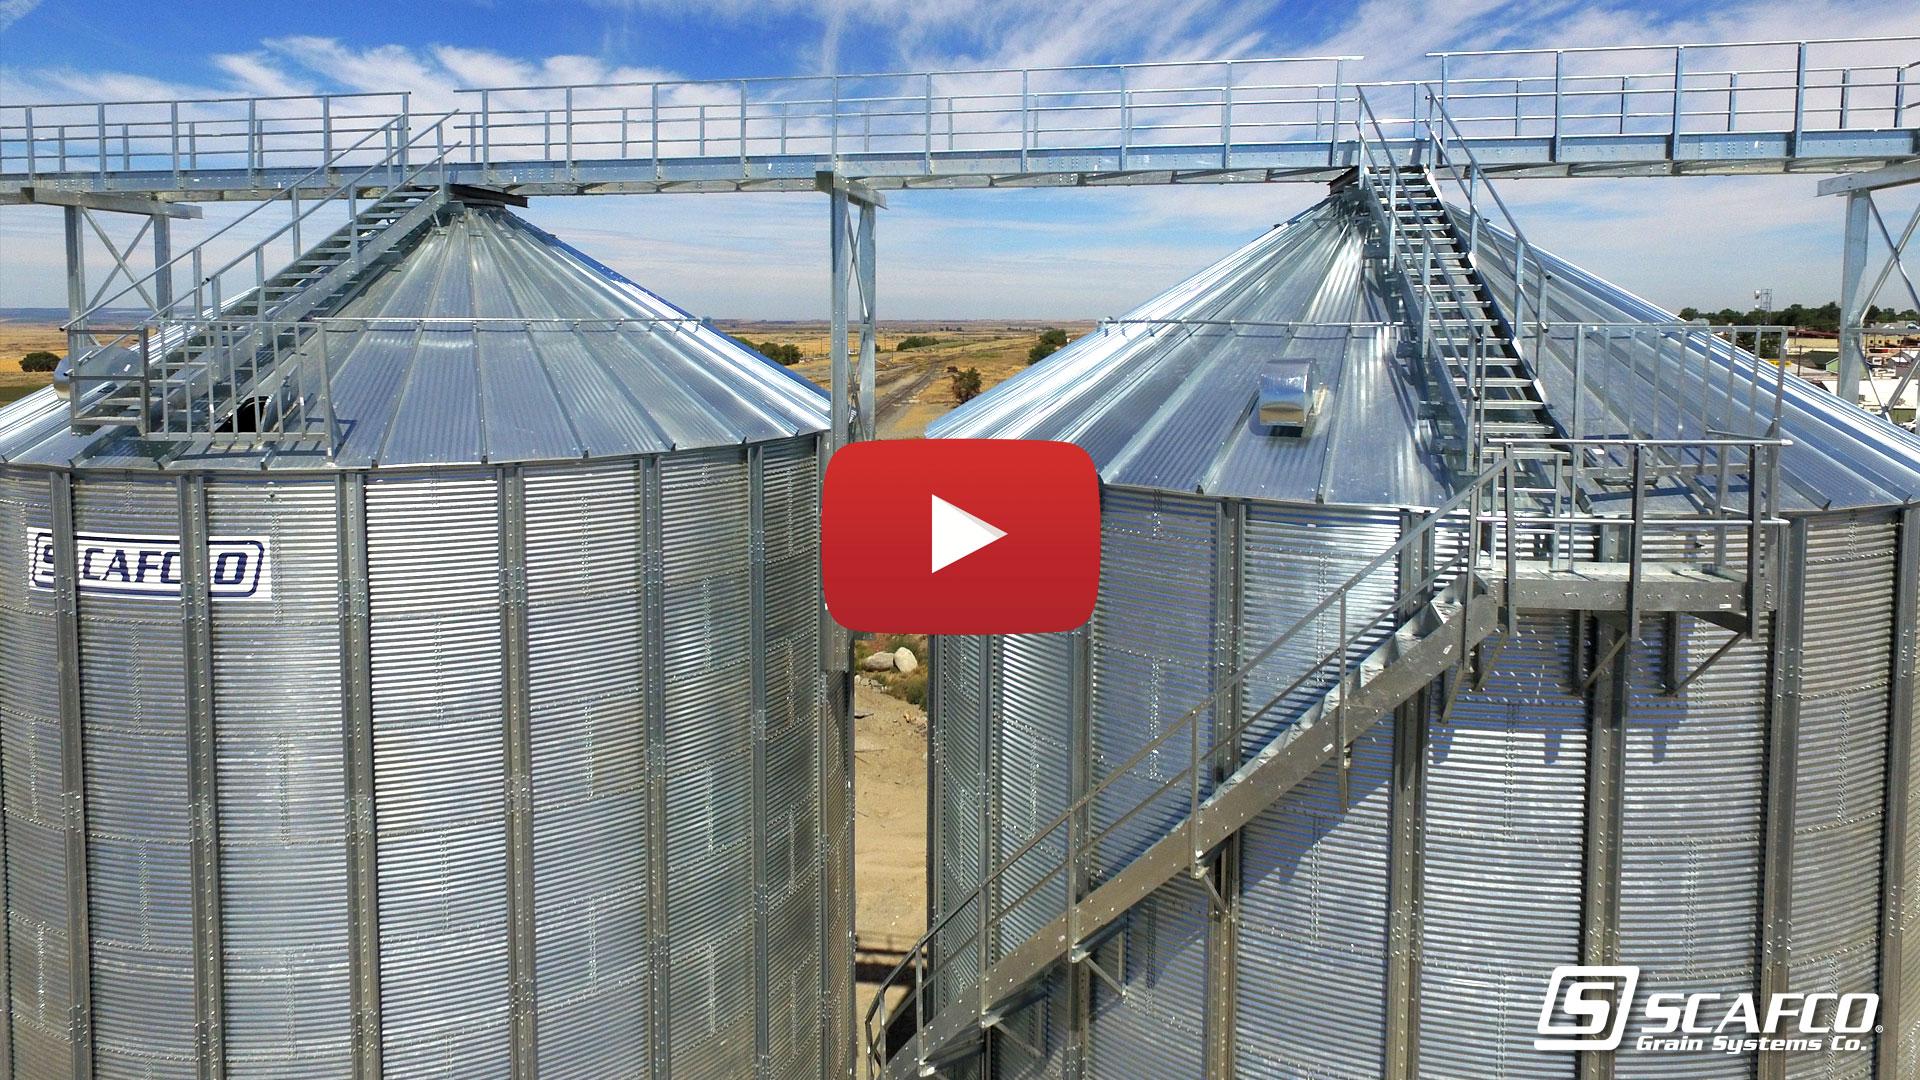 Project library – SCAFCO Grain Systems